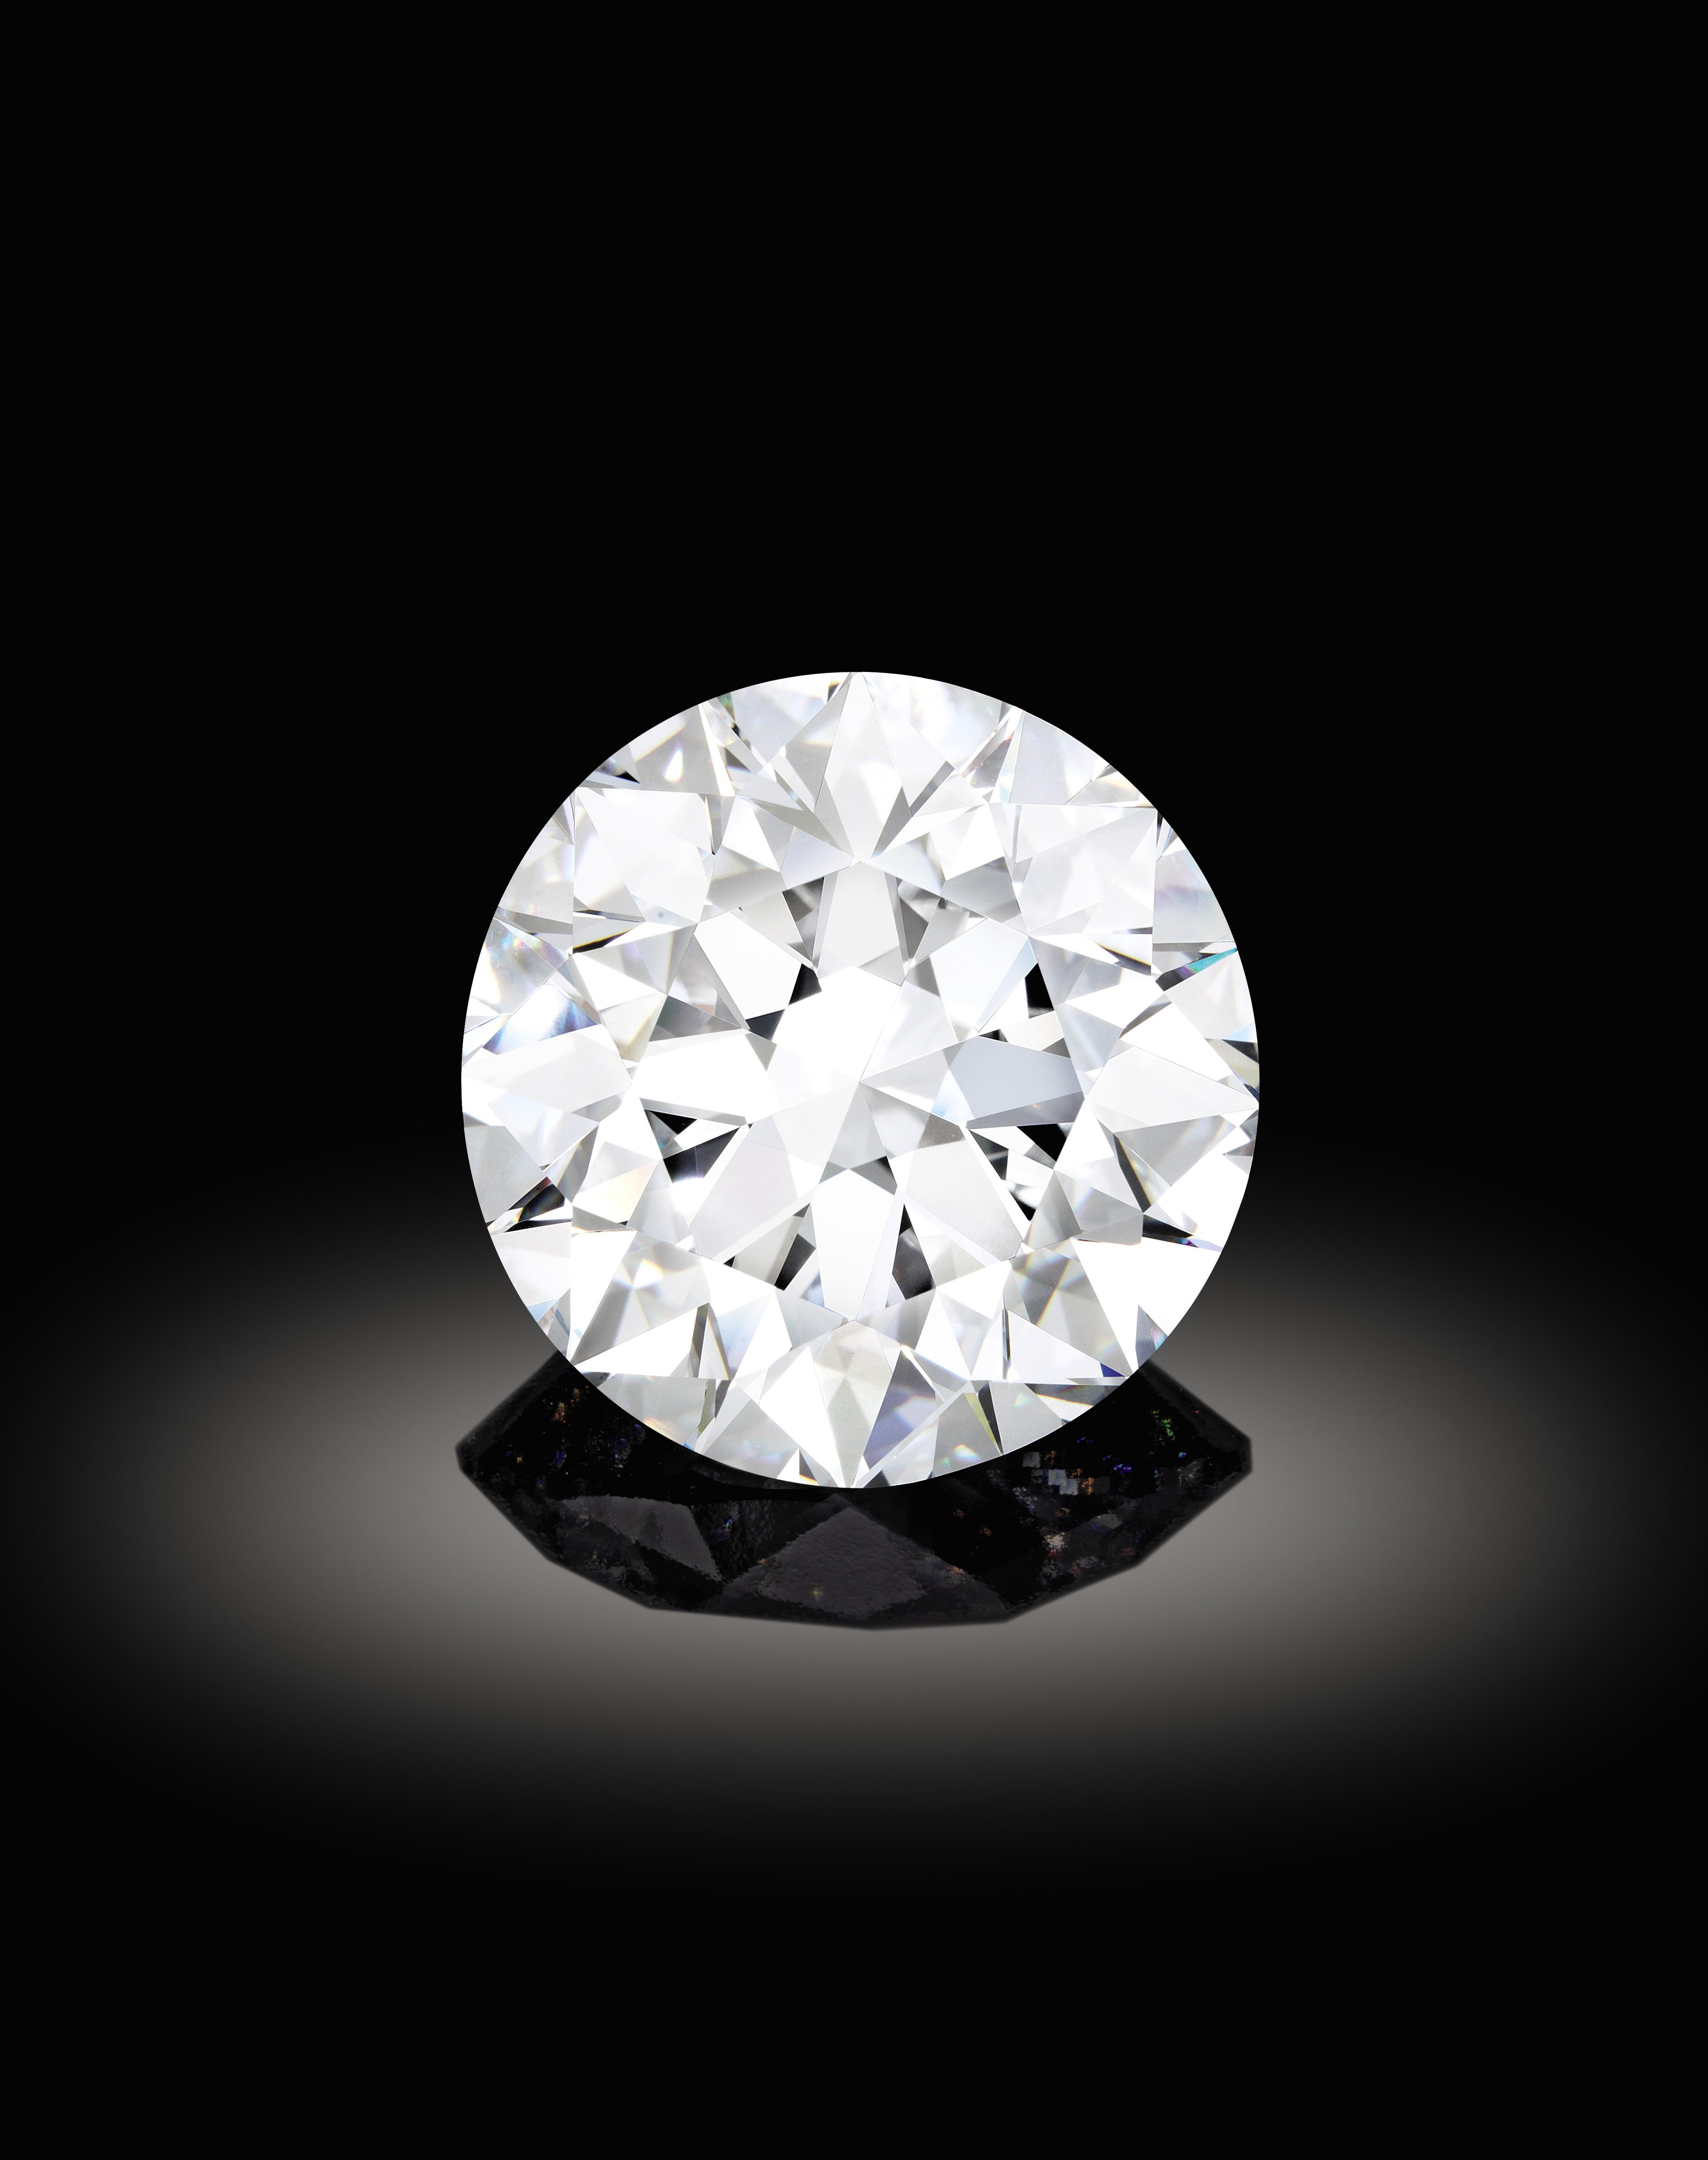 Sotheby S Diamonds 102 34 Carat D Colour Flawless Type